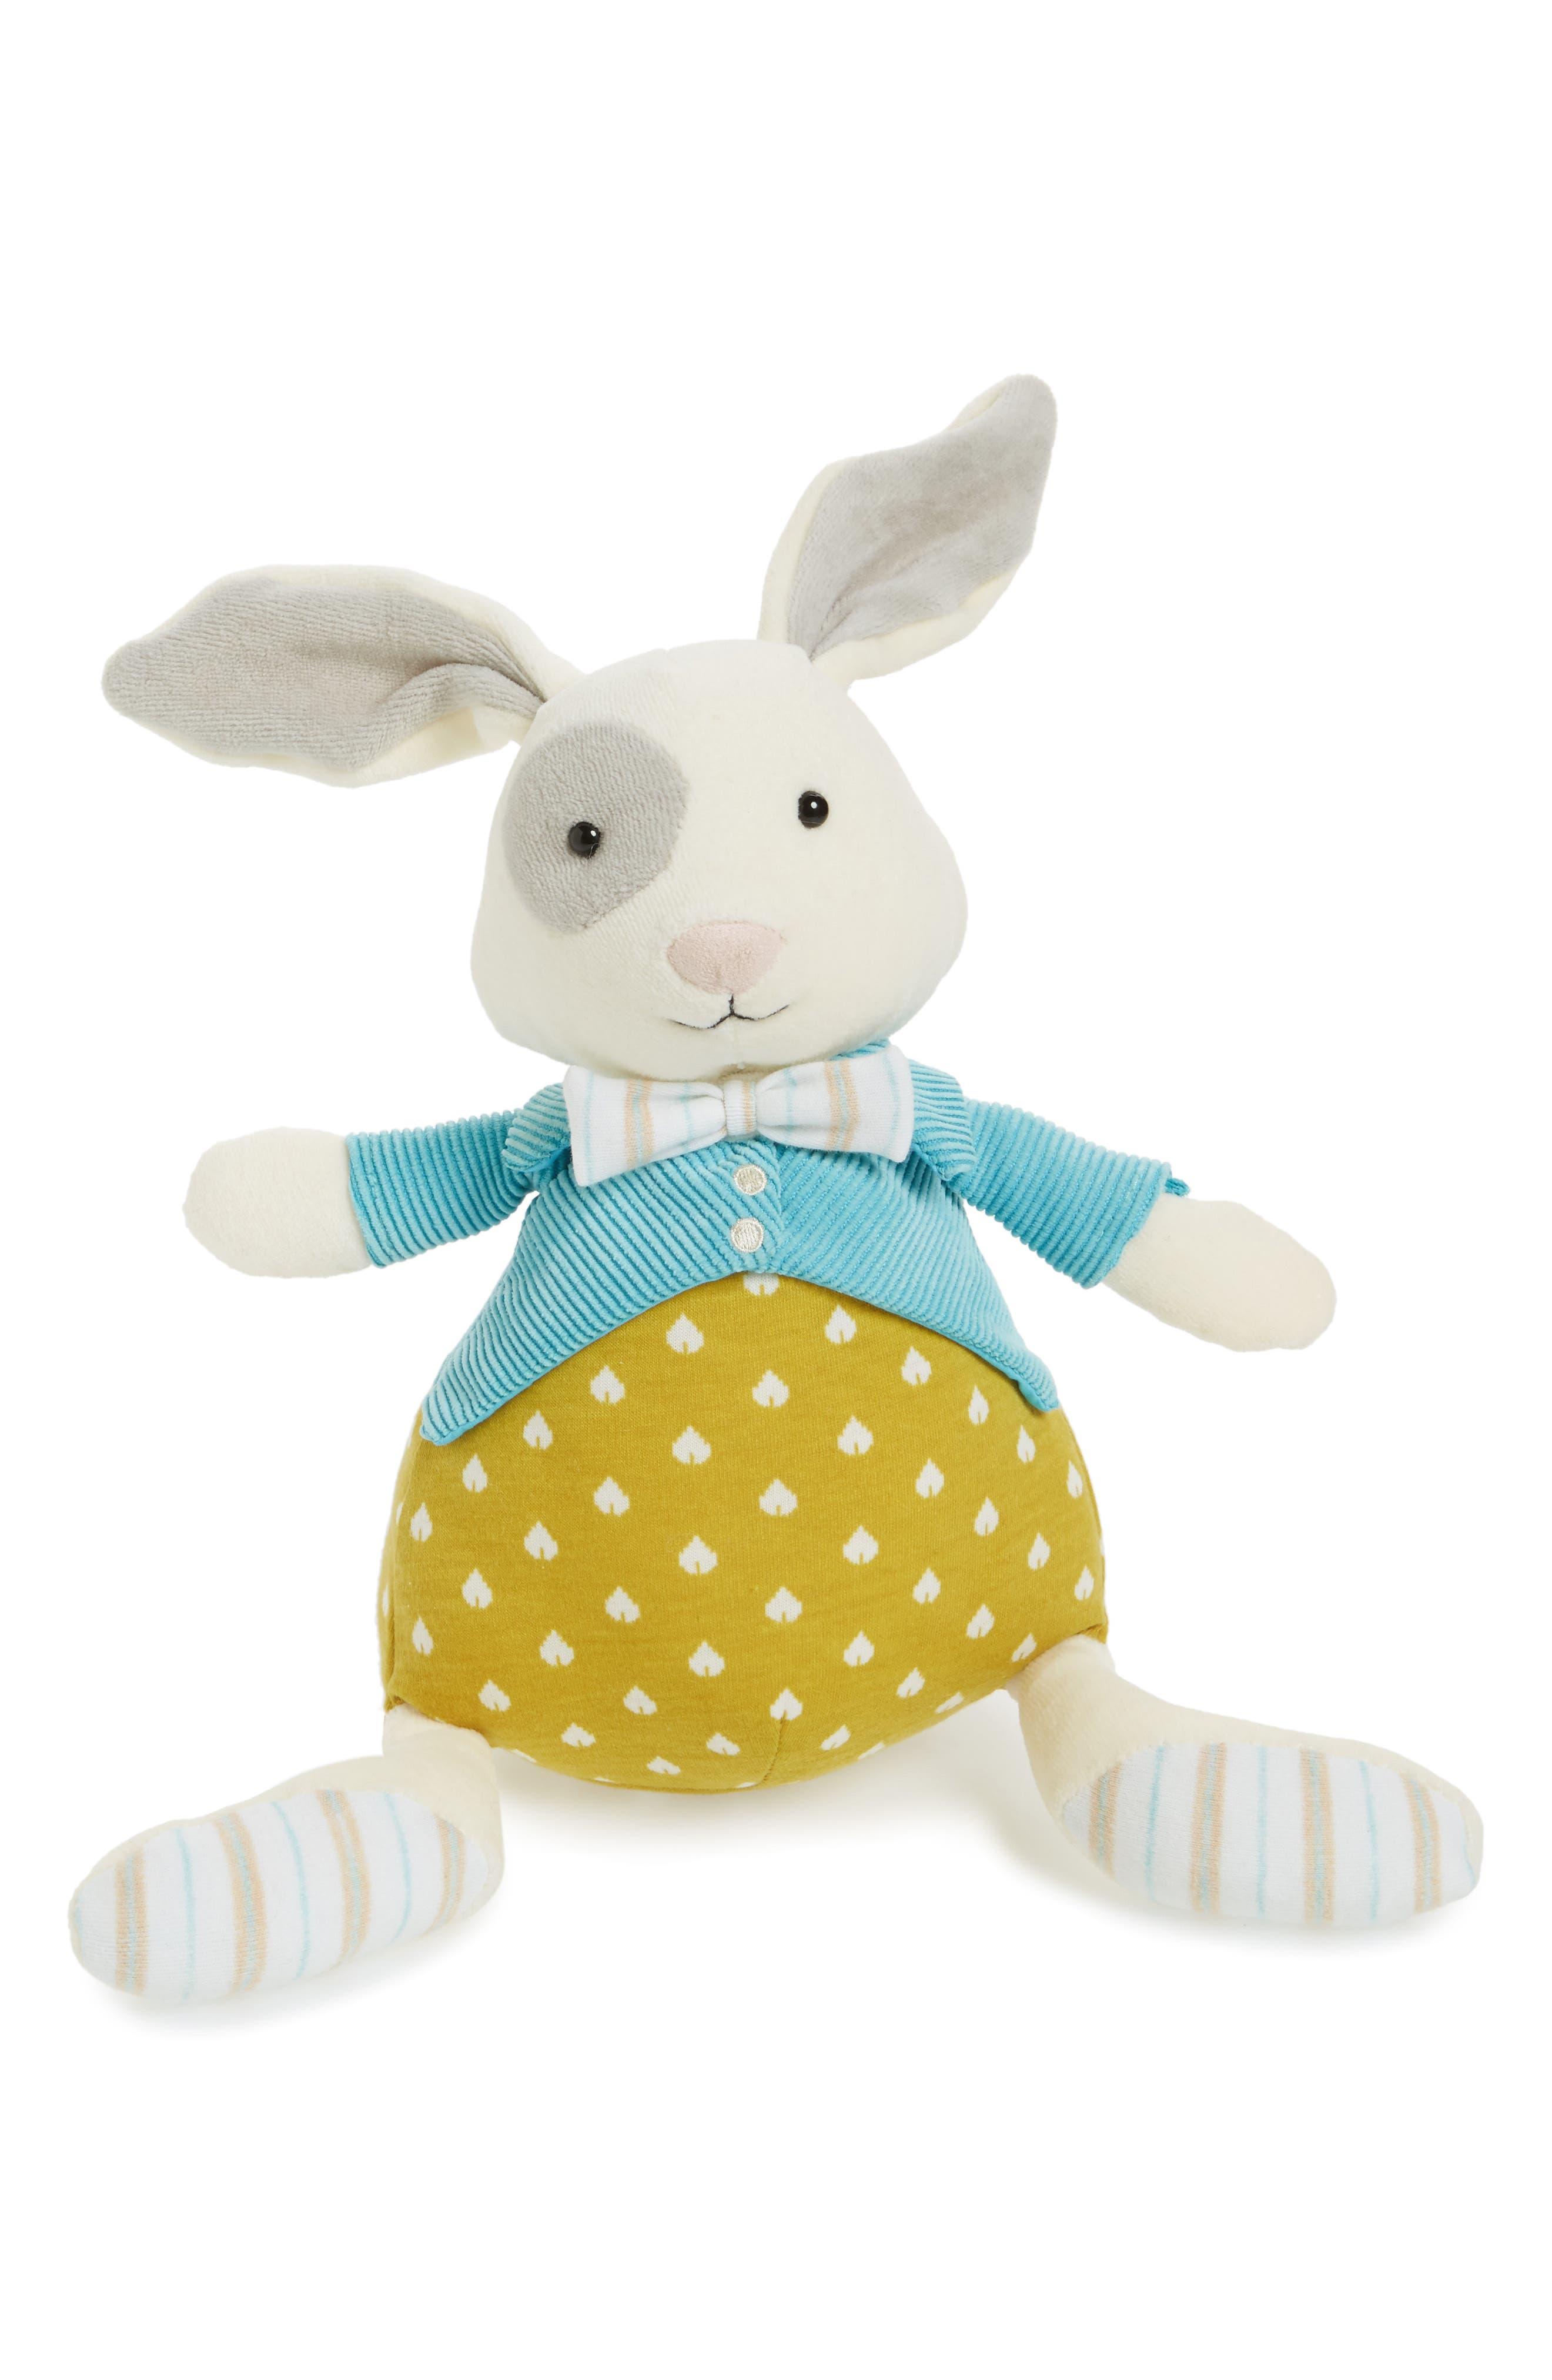 Lewis Rabbit Stuffed Animal,                             Main thumbnail 1, color,                             Multi